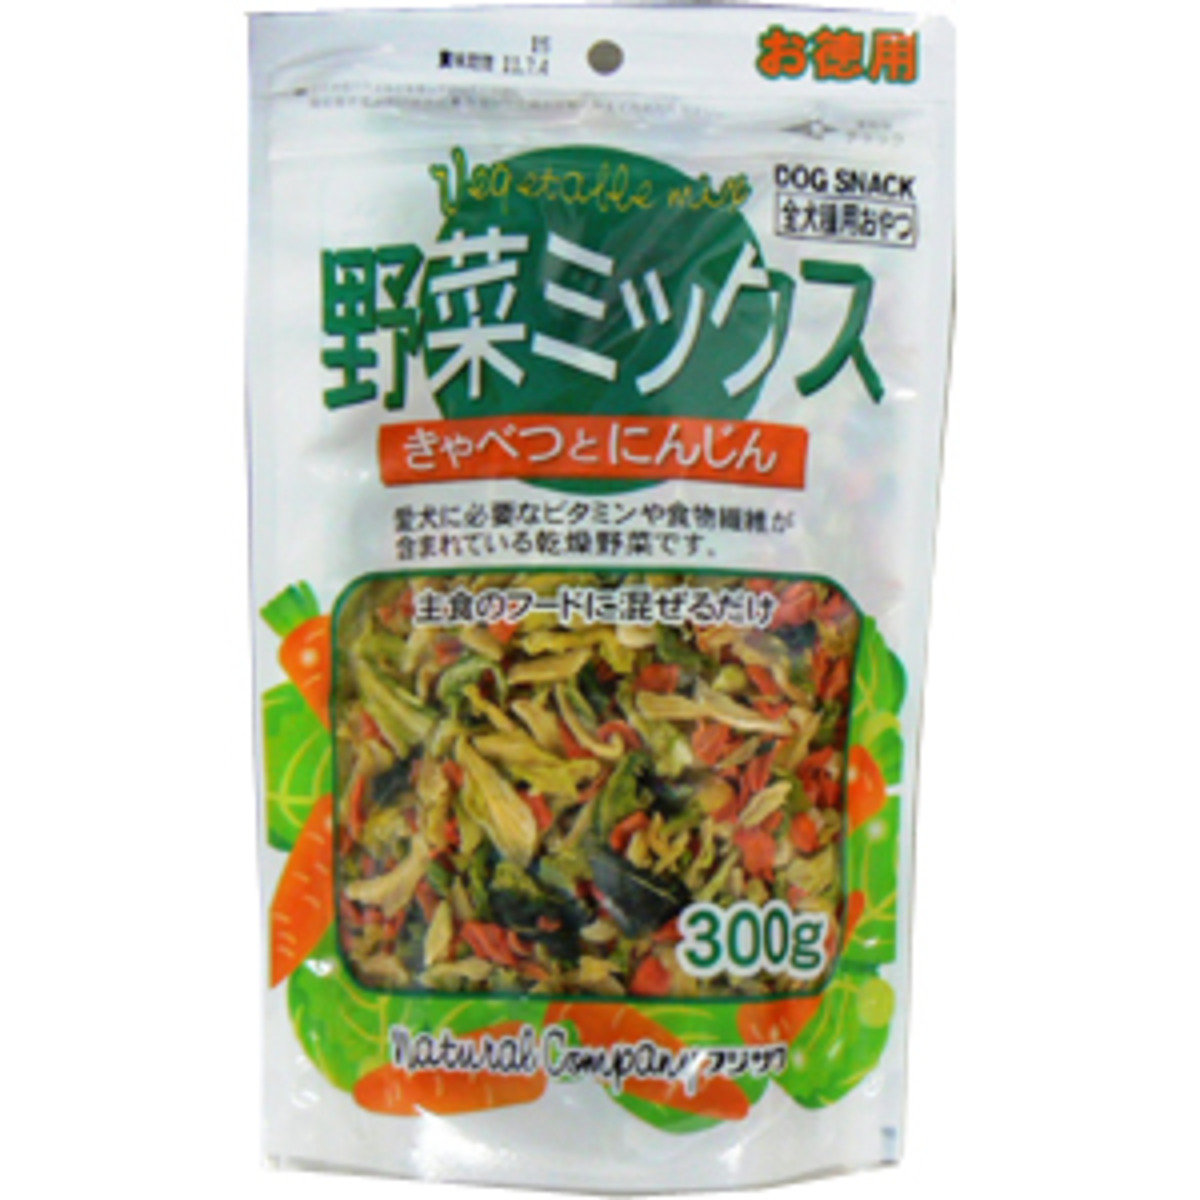 FUJISAWA 混合蔬菜片